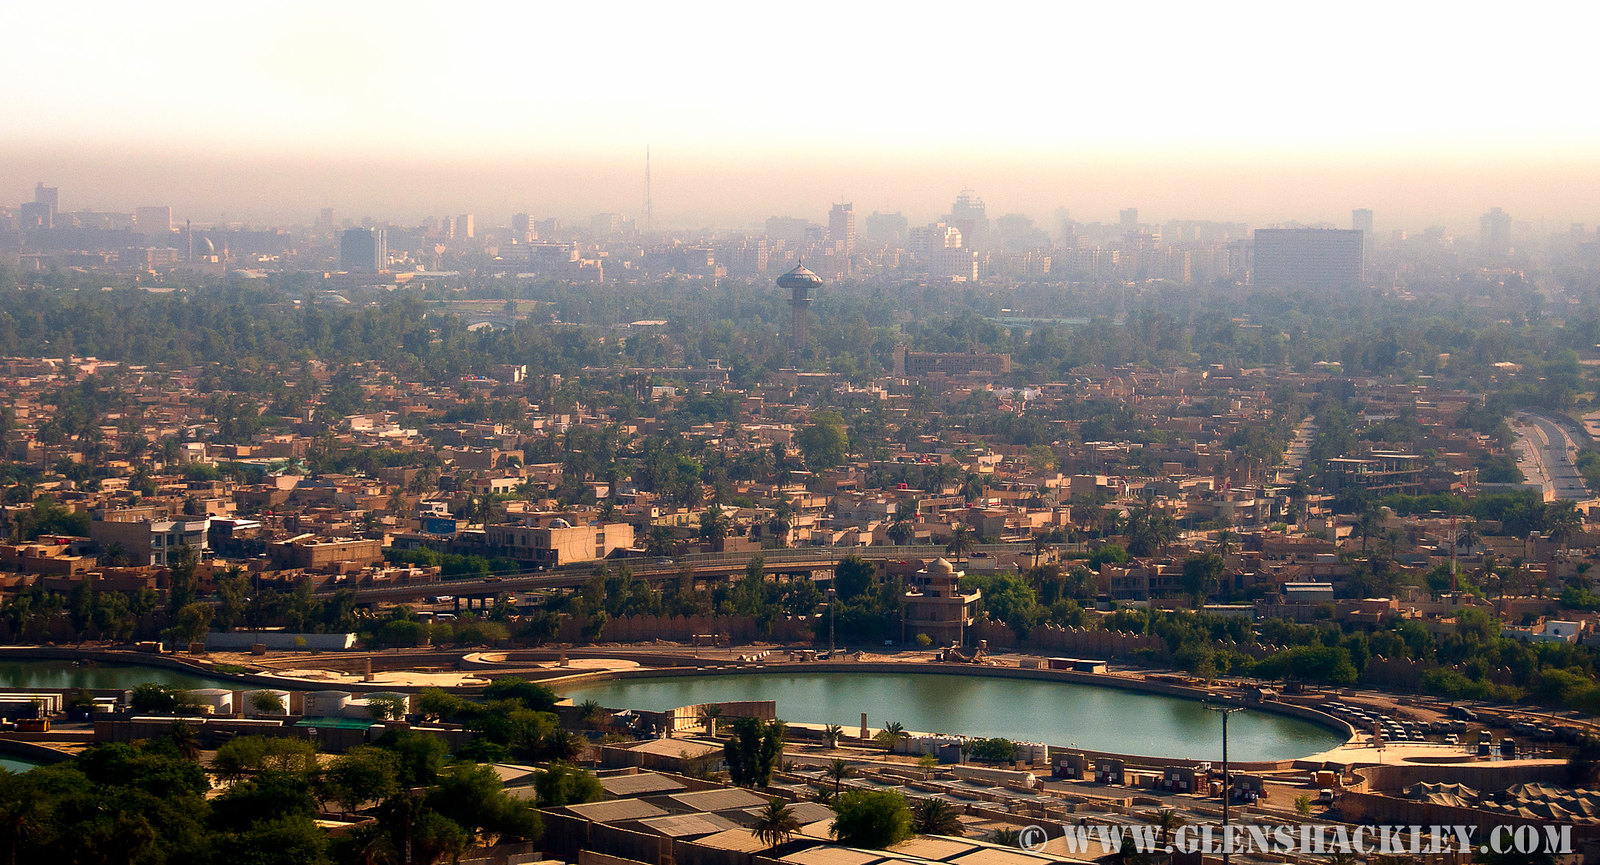 Baghdad - Iraq - Page 8 - SkyscraperCity